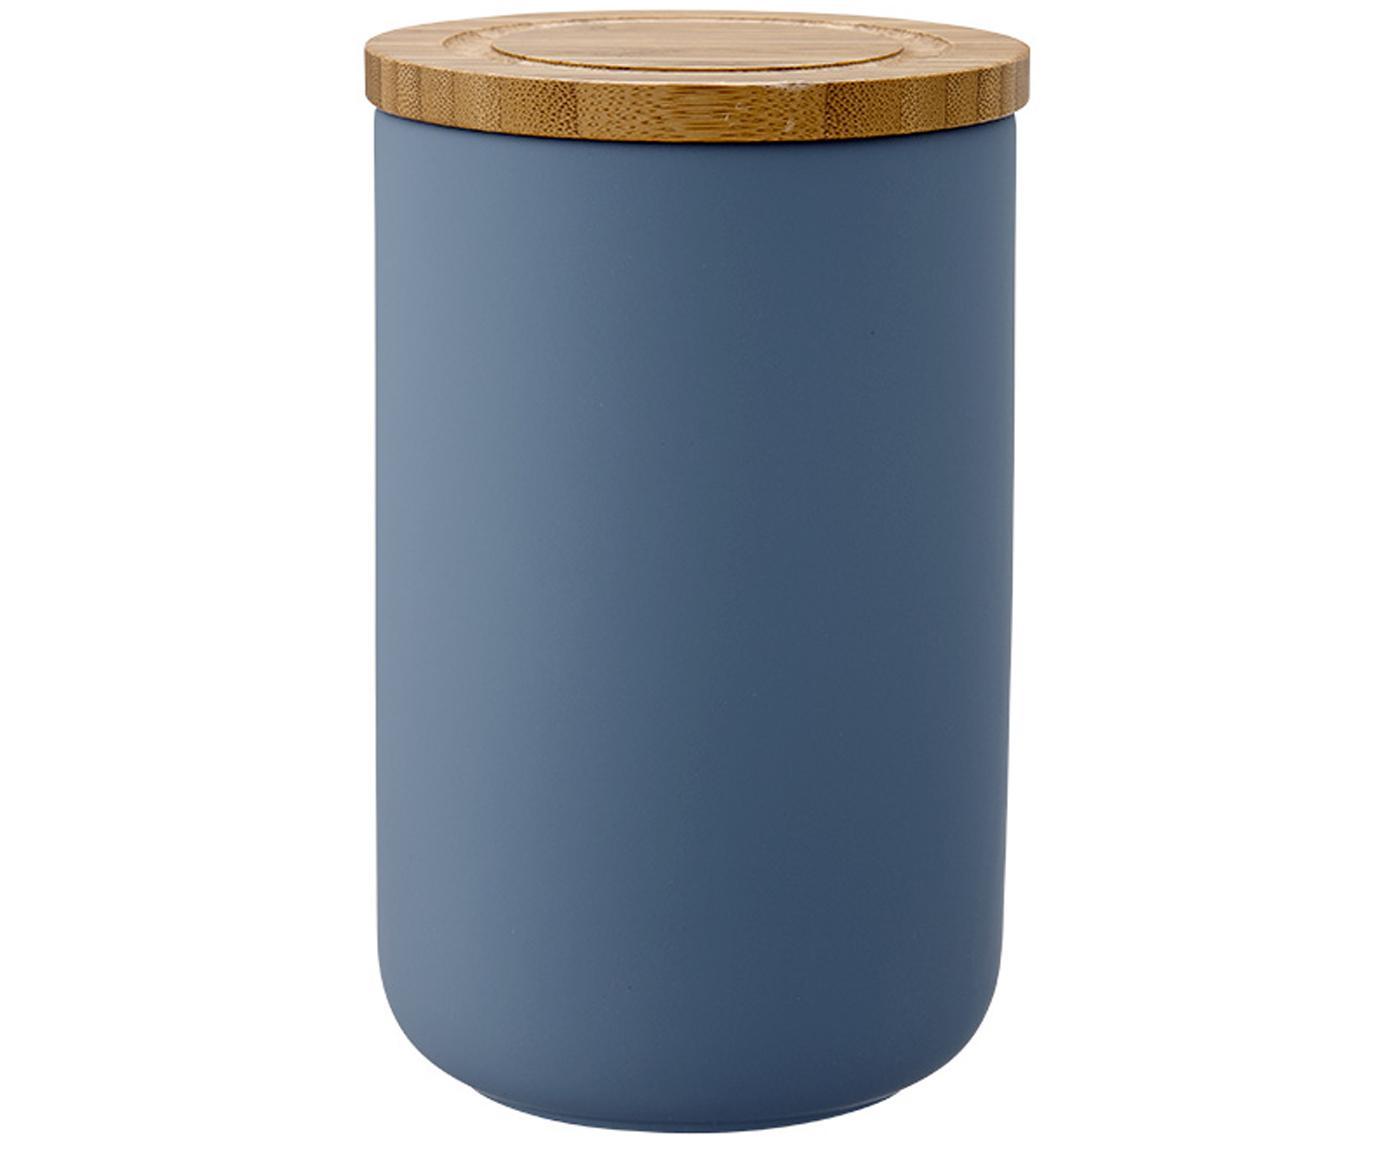 Aufbewahrungsdose Stak, Dose: Keramik, Deckel: Bambusholz, Mattblau, Bambus, Ø 10 x H 17 cm